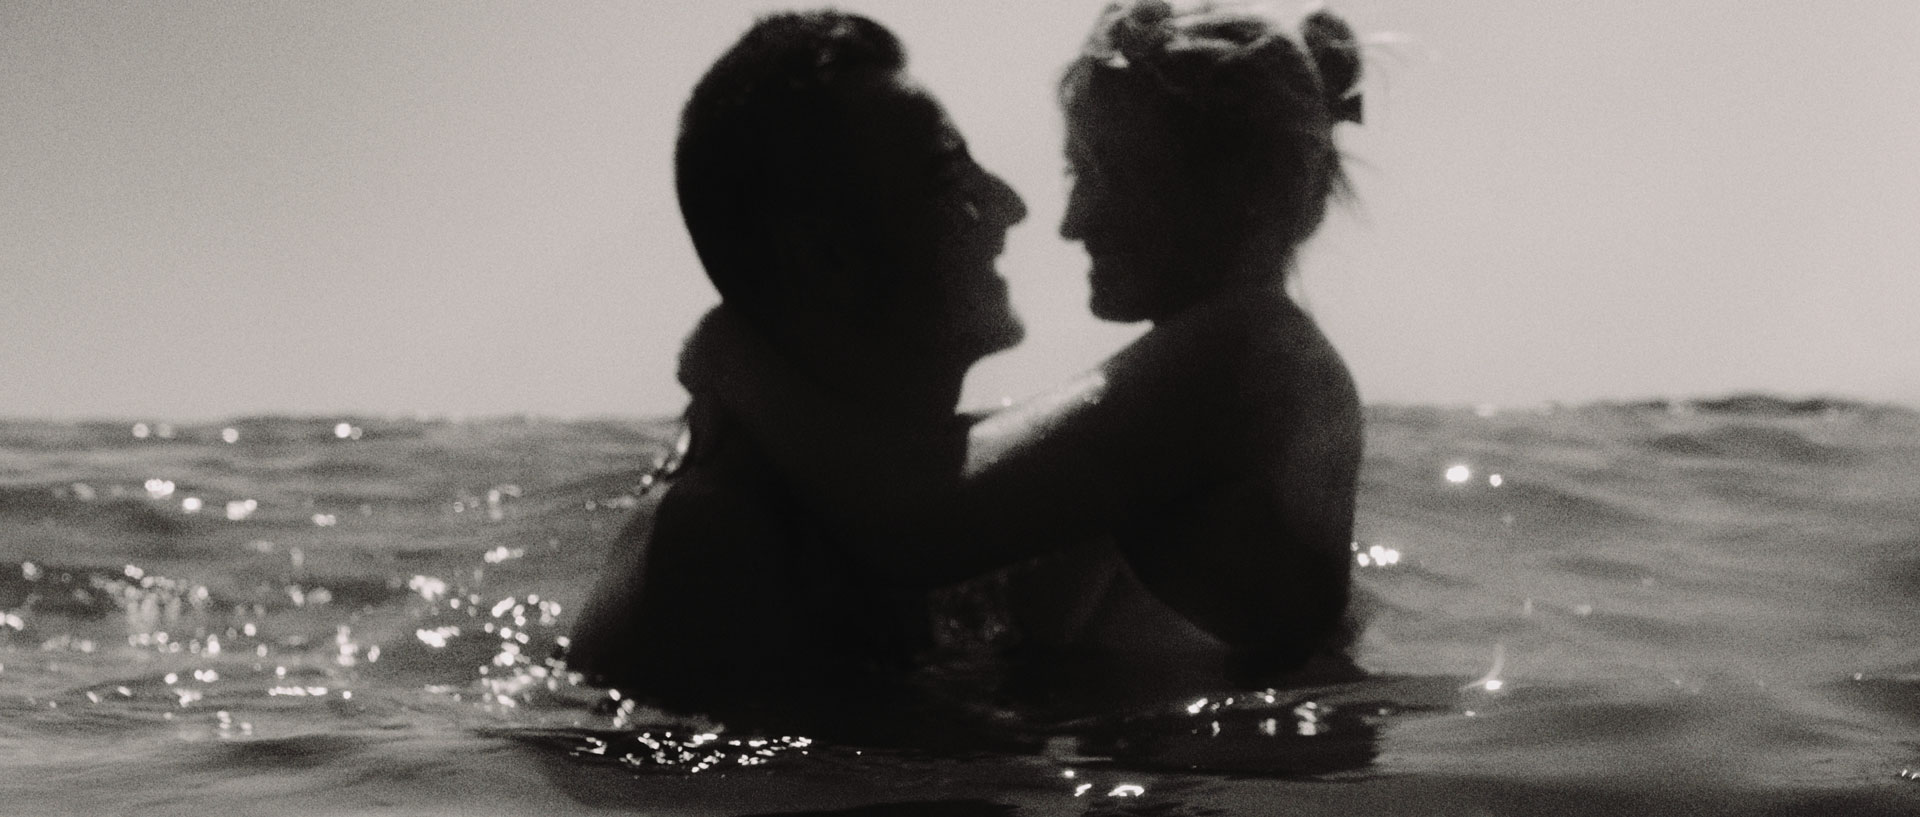 Delphine & Romulad Domaine Moures Bord de Mer Film Mariage (2).jpg